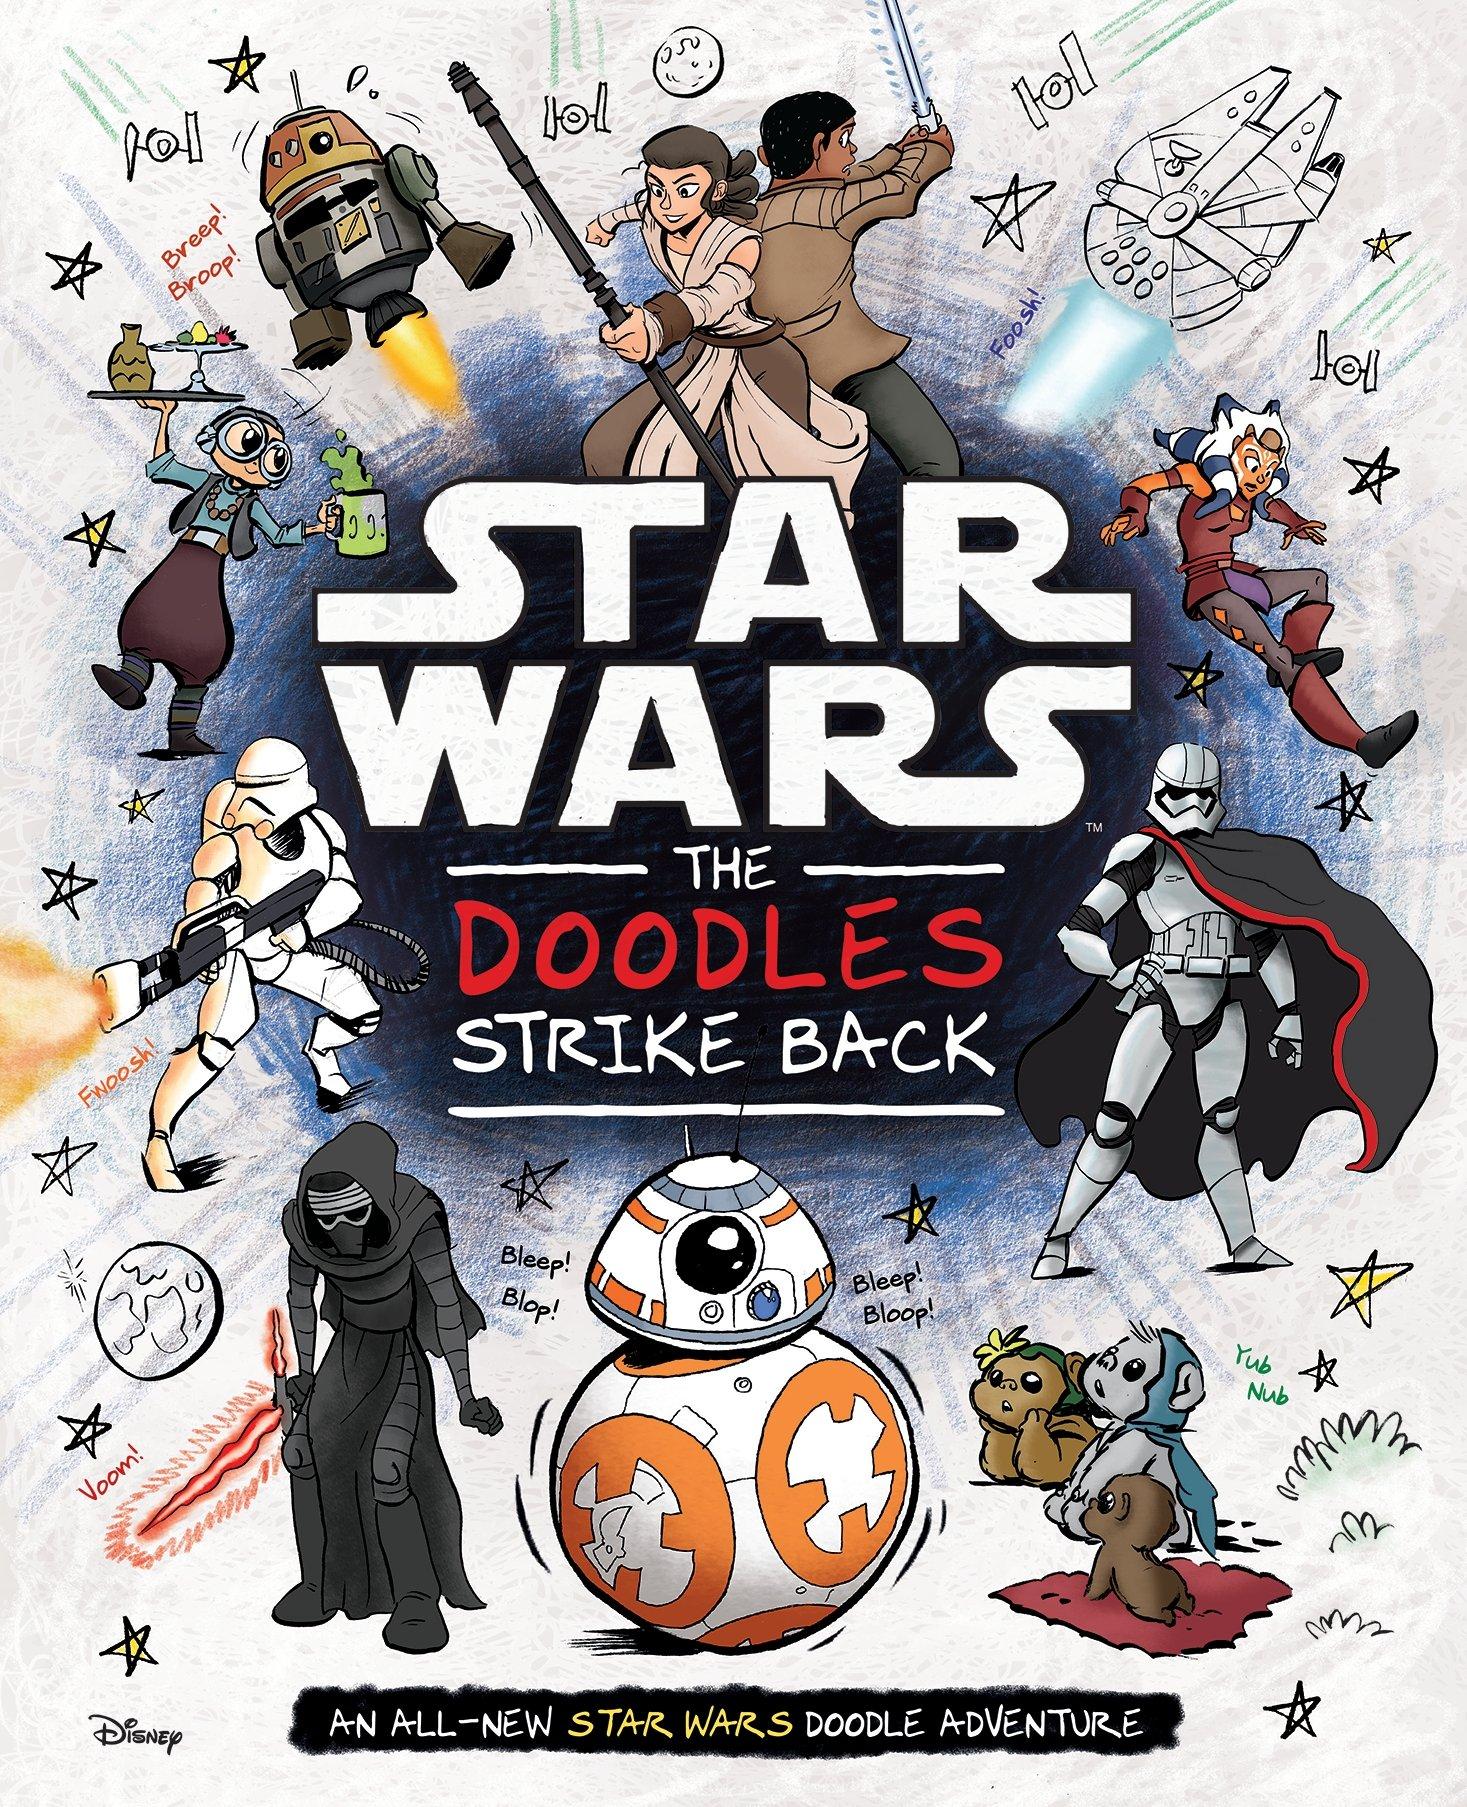 Doodles strike back cover.jpg